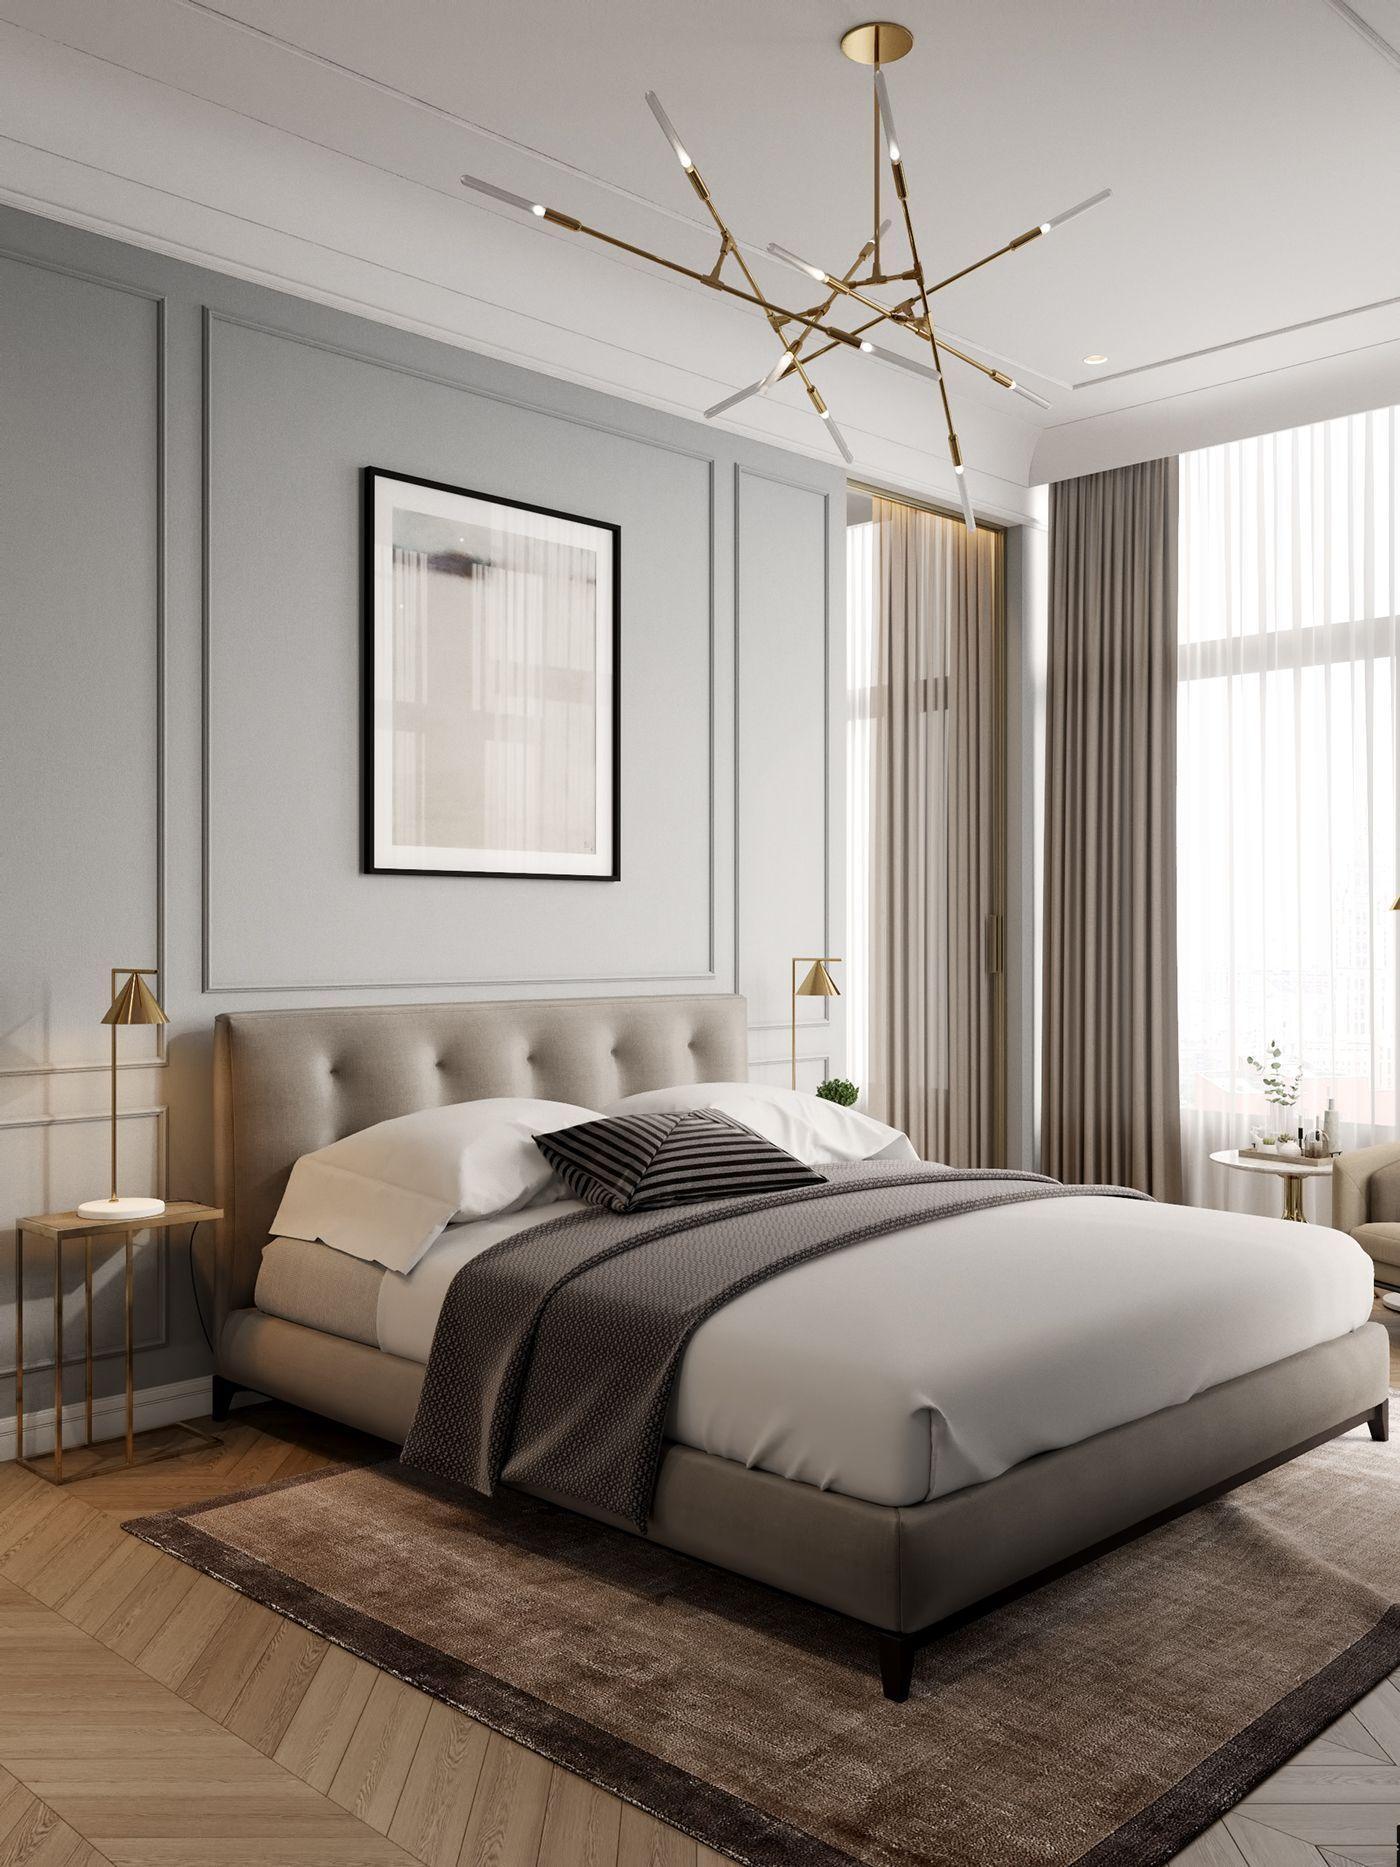 41 Amazing Contemporary Interior Design 2019 - #moderninteriordesign